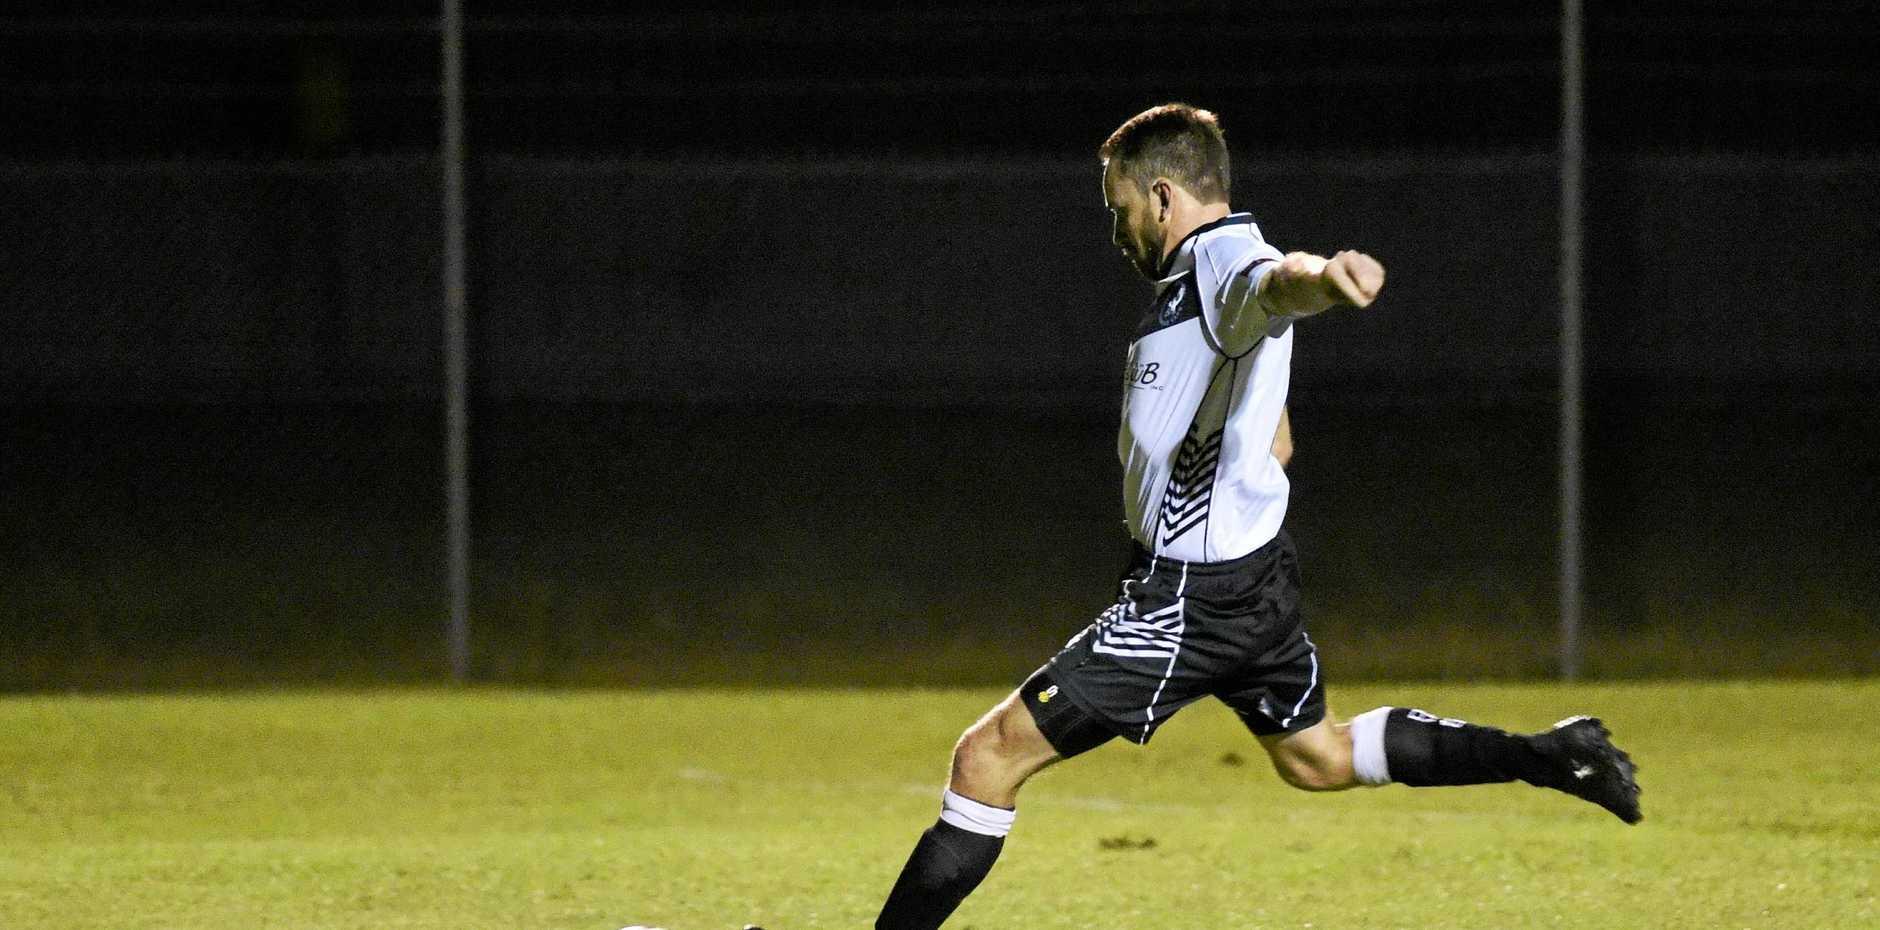 Doon Villa's Joel Neilsen takes a penalty. FFA Cup: Doon Villa v Sunshine Coast Fire at Villa Park, Maryborough.